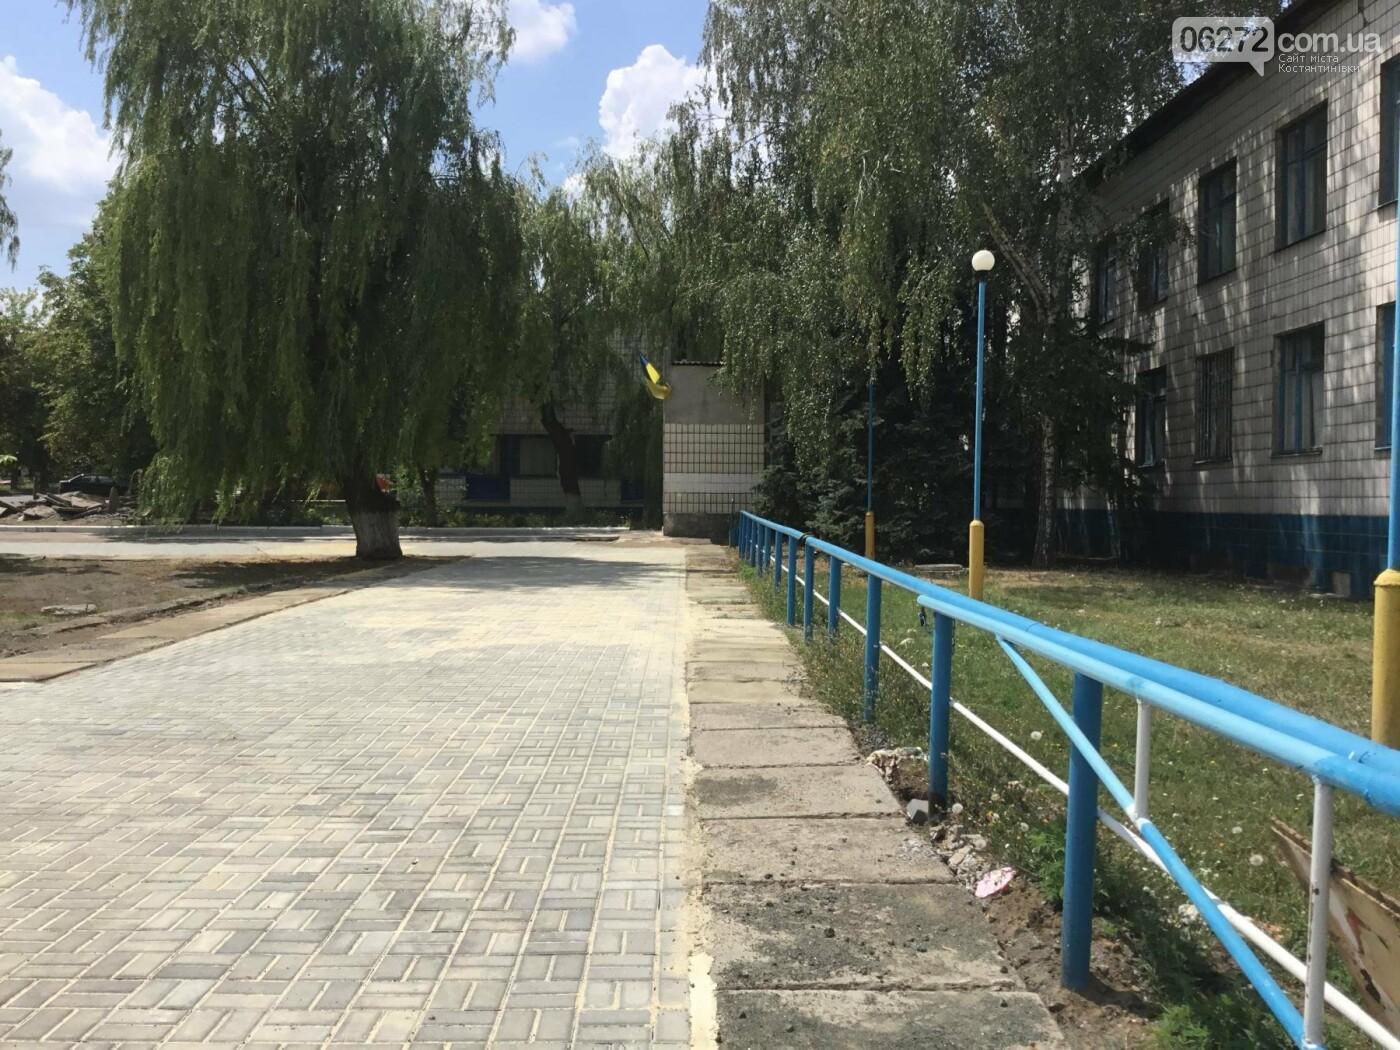 В Константиновке продолжают ремонт дорог, фото-13